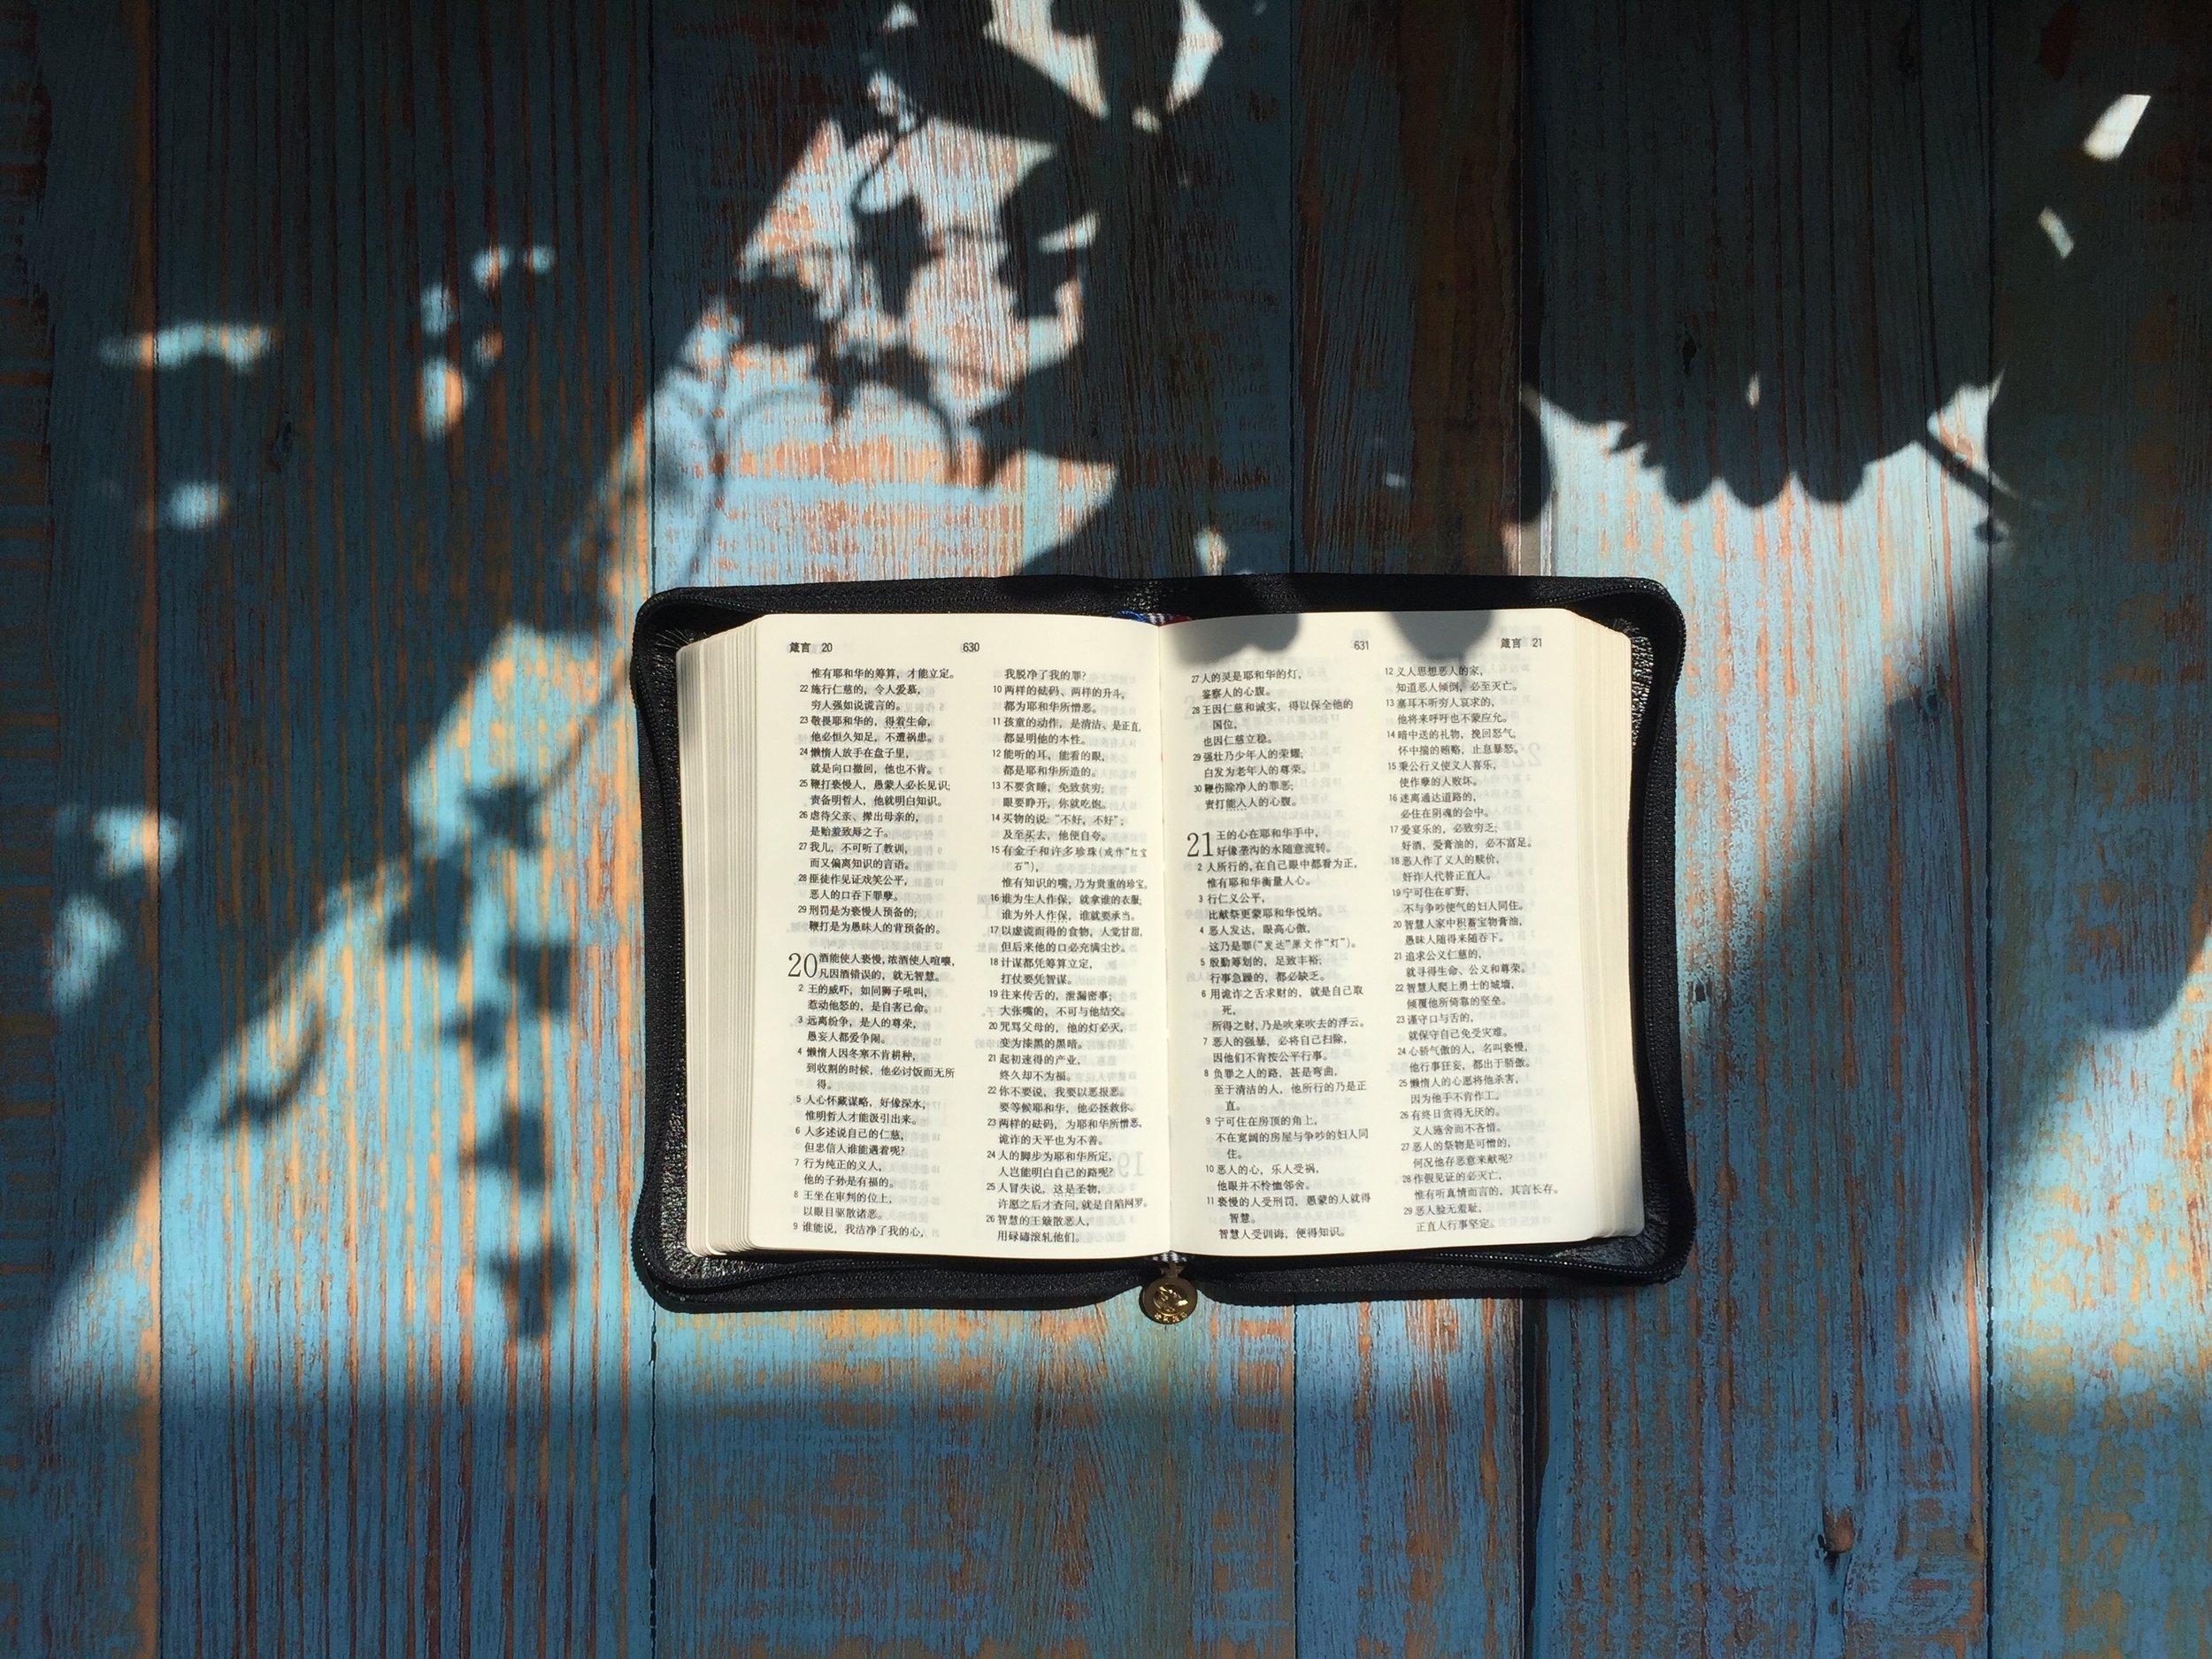 ISAIAH 2.1-4 -